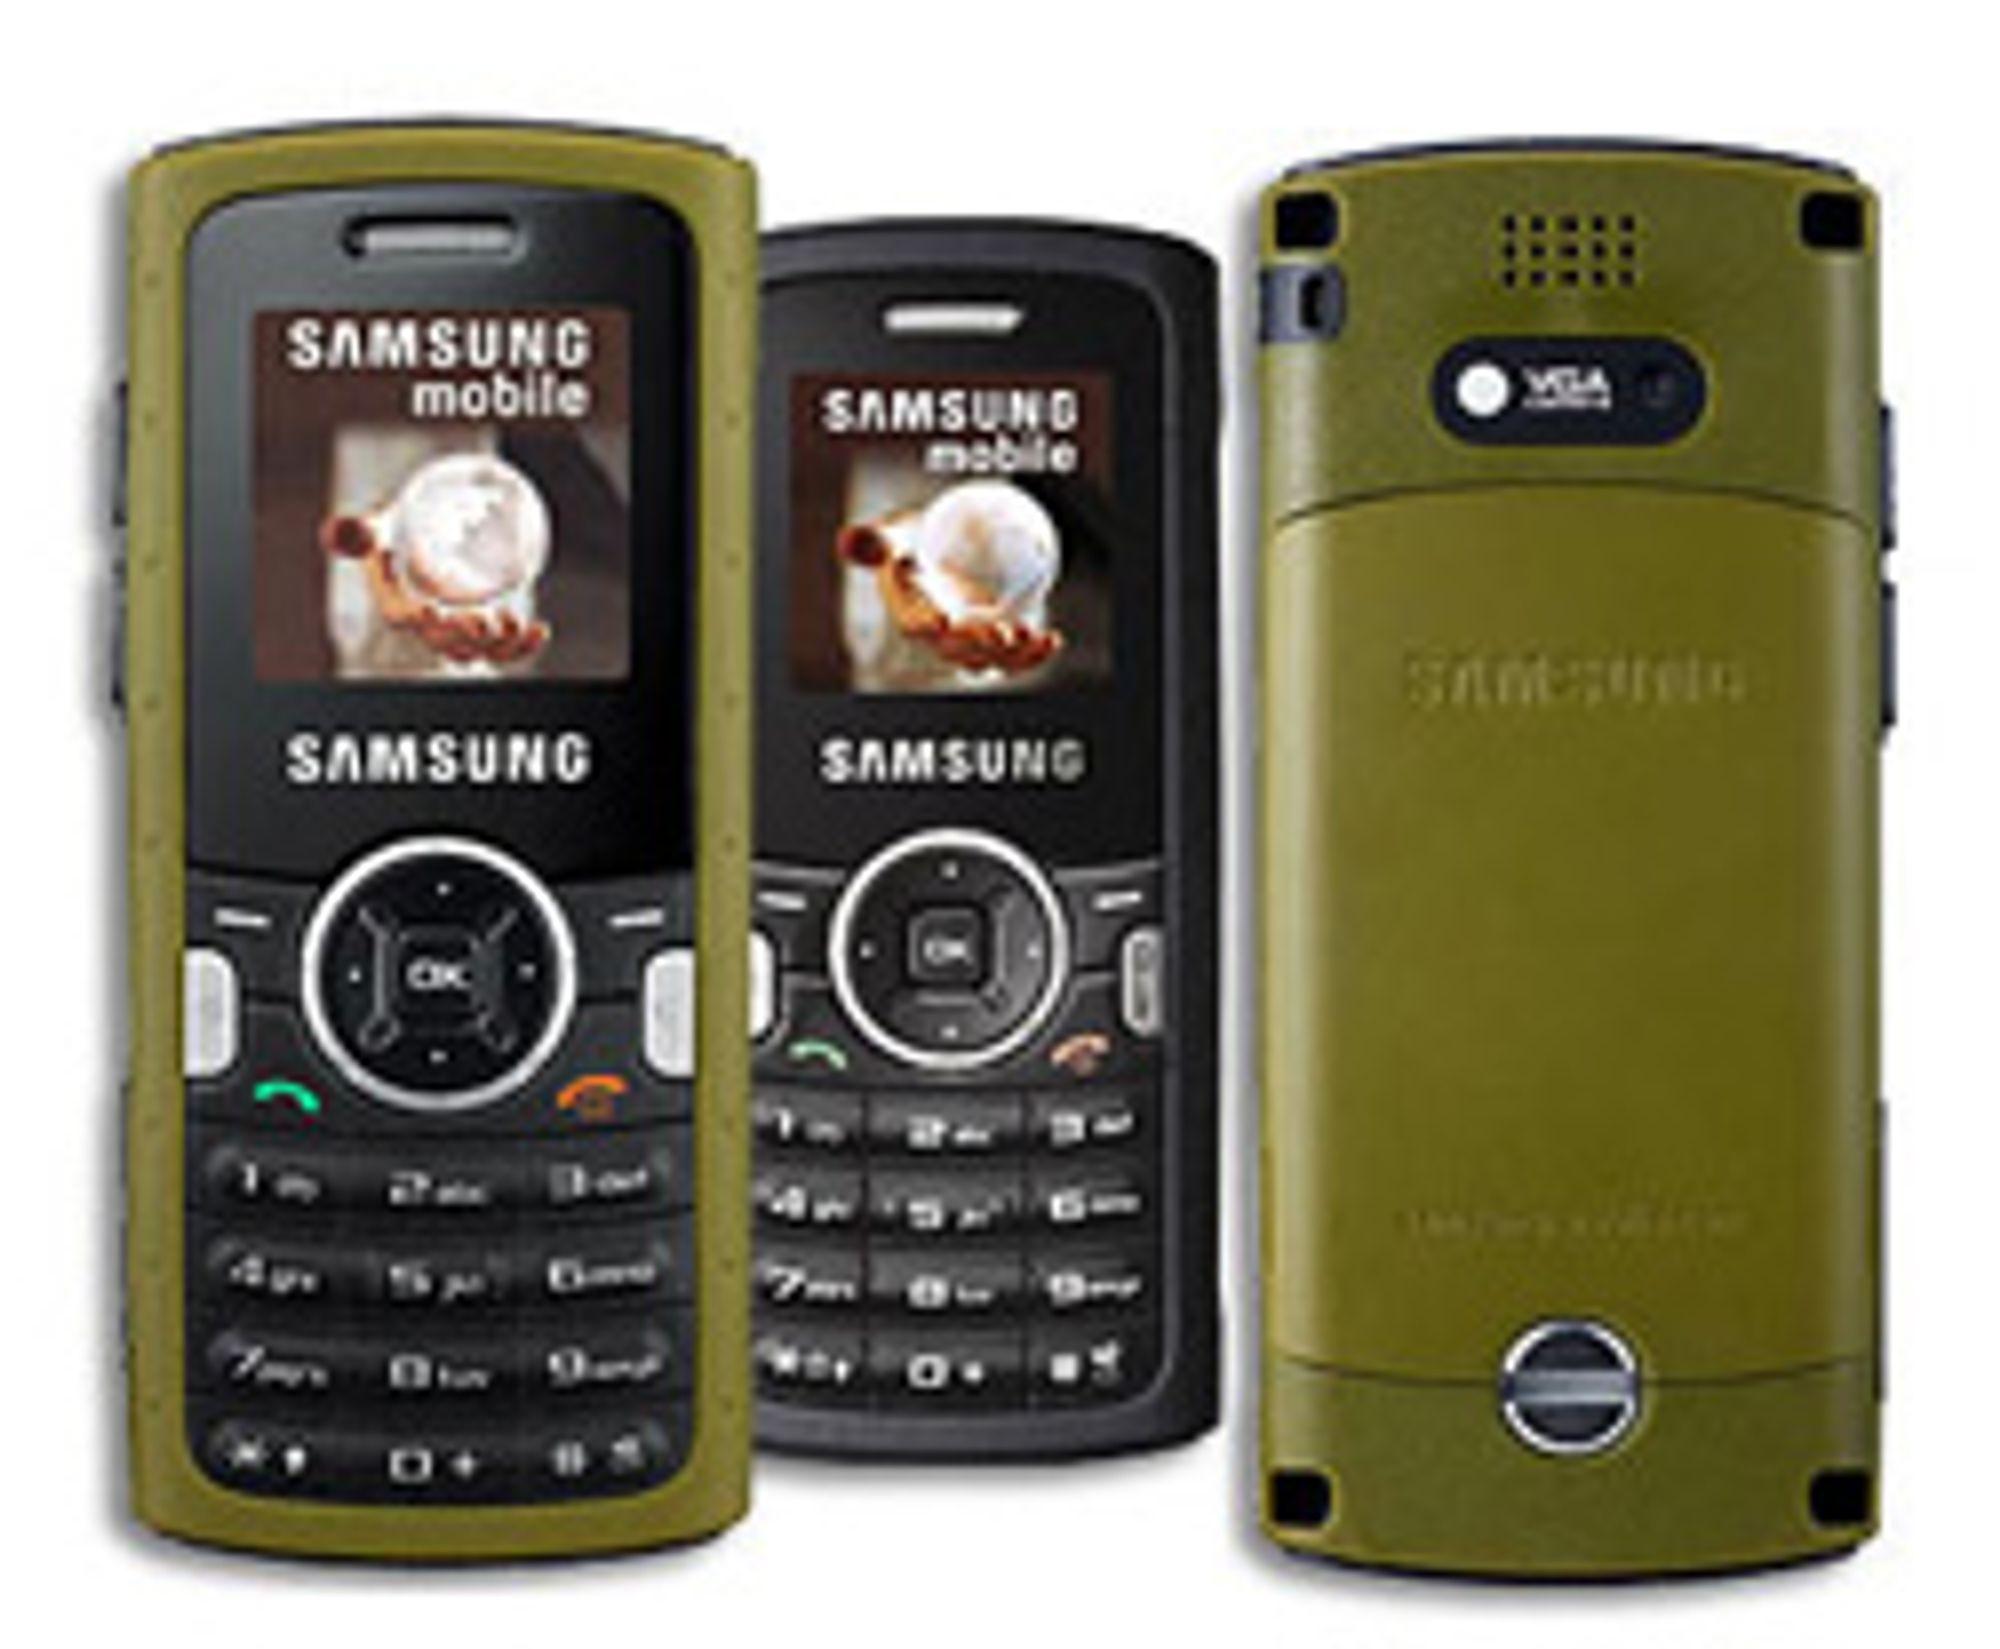 Slik ser Samsungs M110 ut. (Foto: Softpedia)